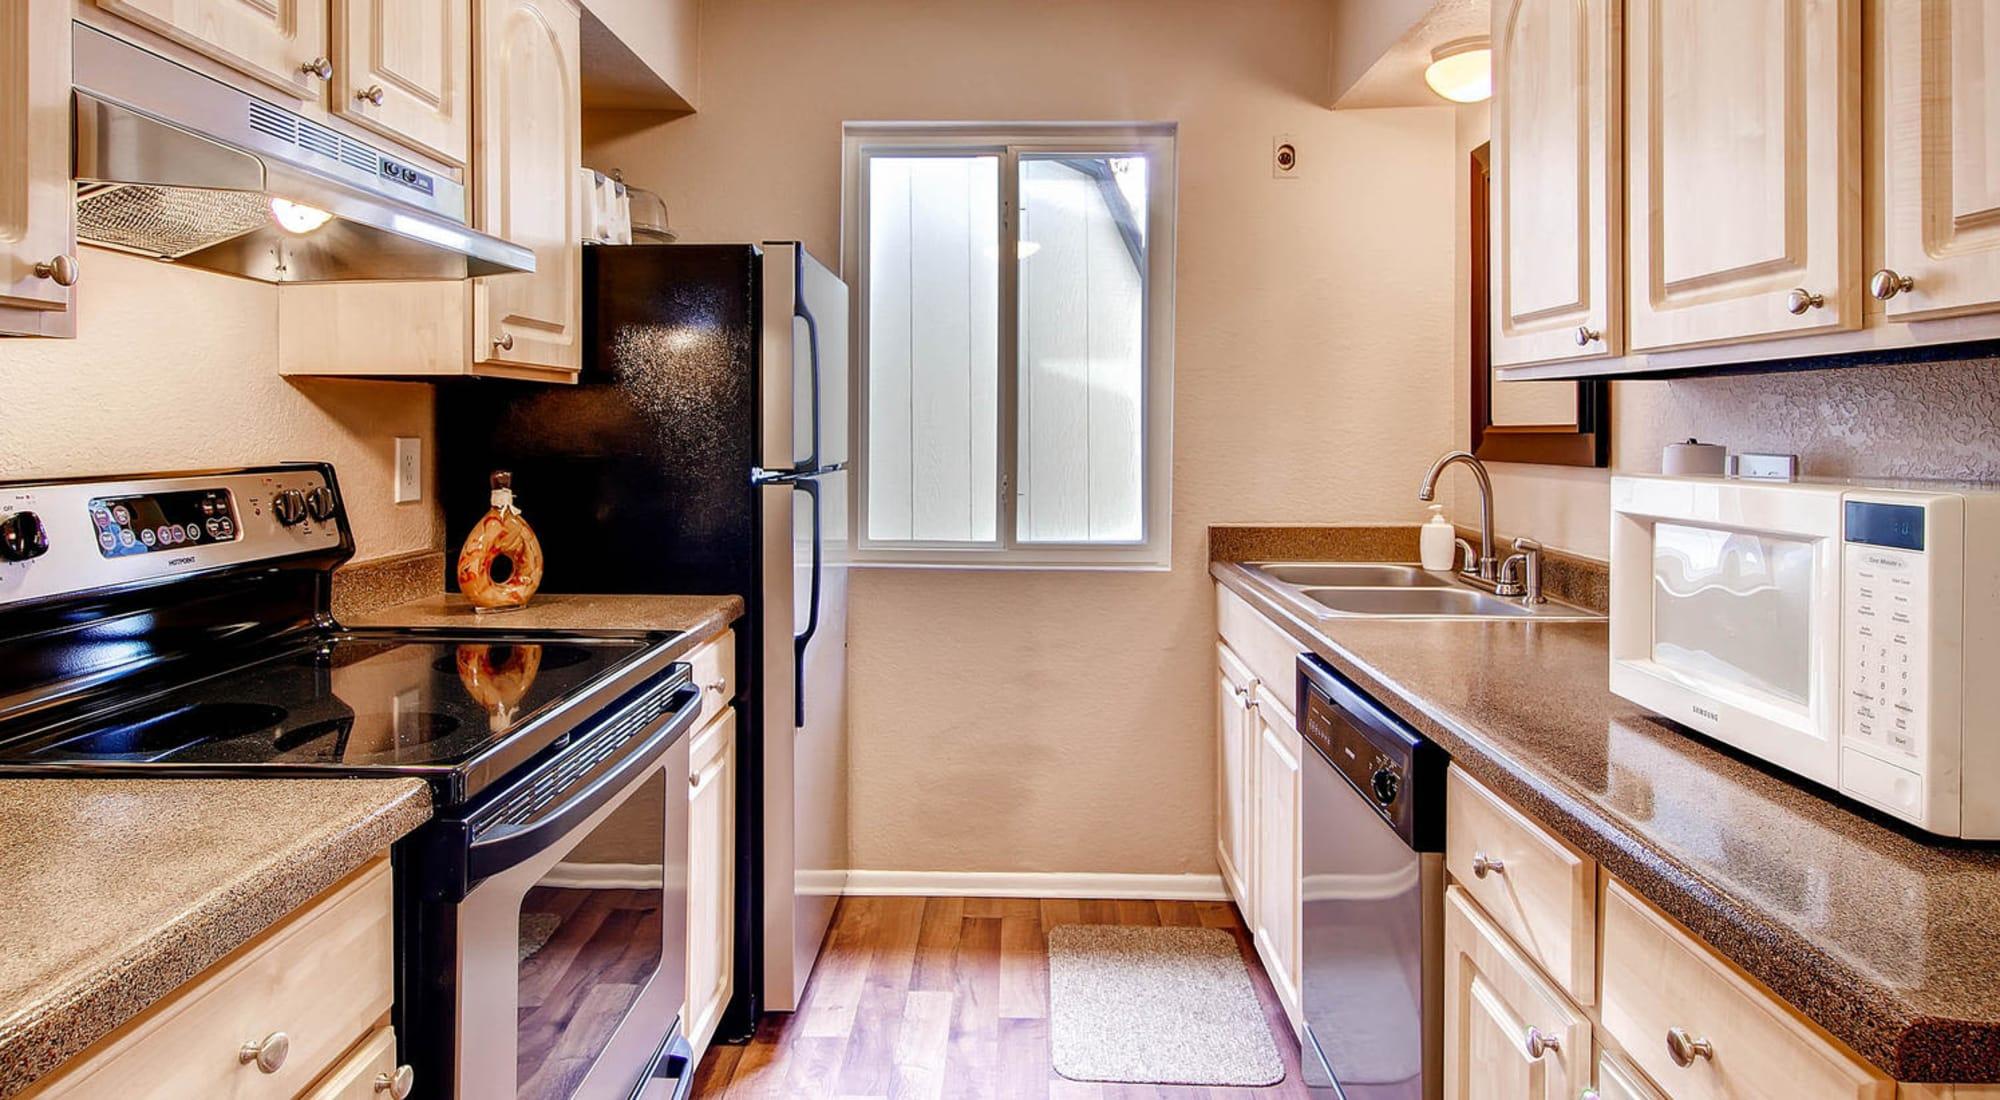 Photo gallery at Arvada Green Apartment Homes in Arvada, Colorado